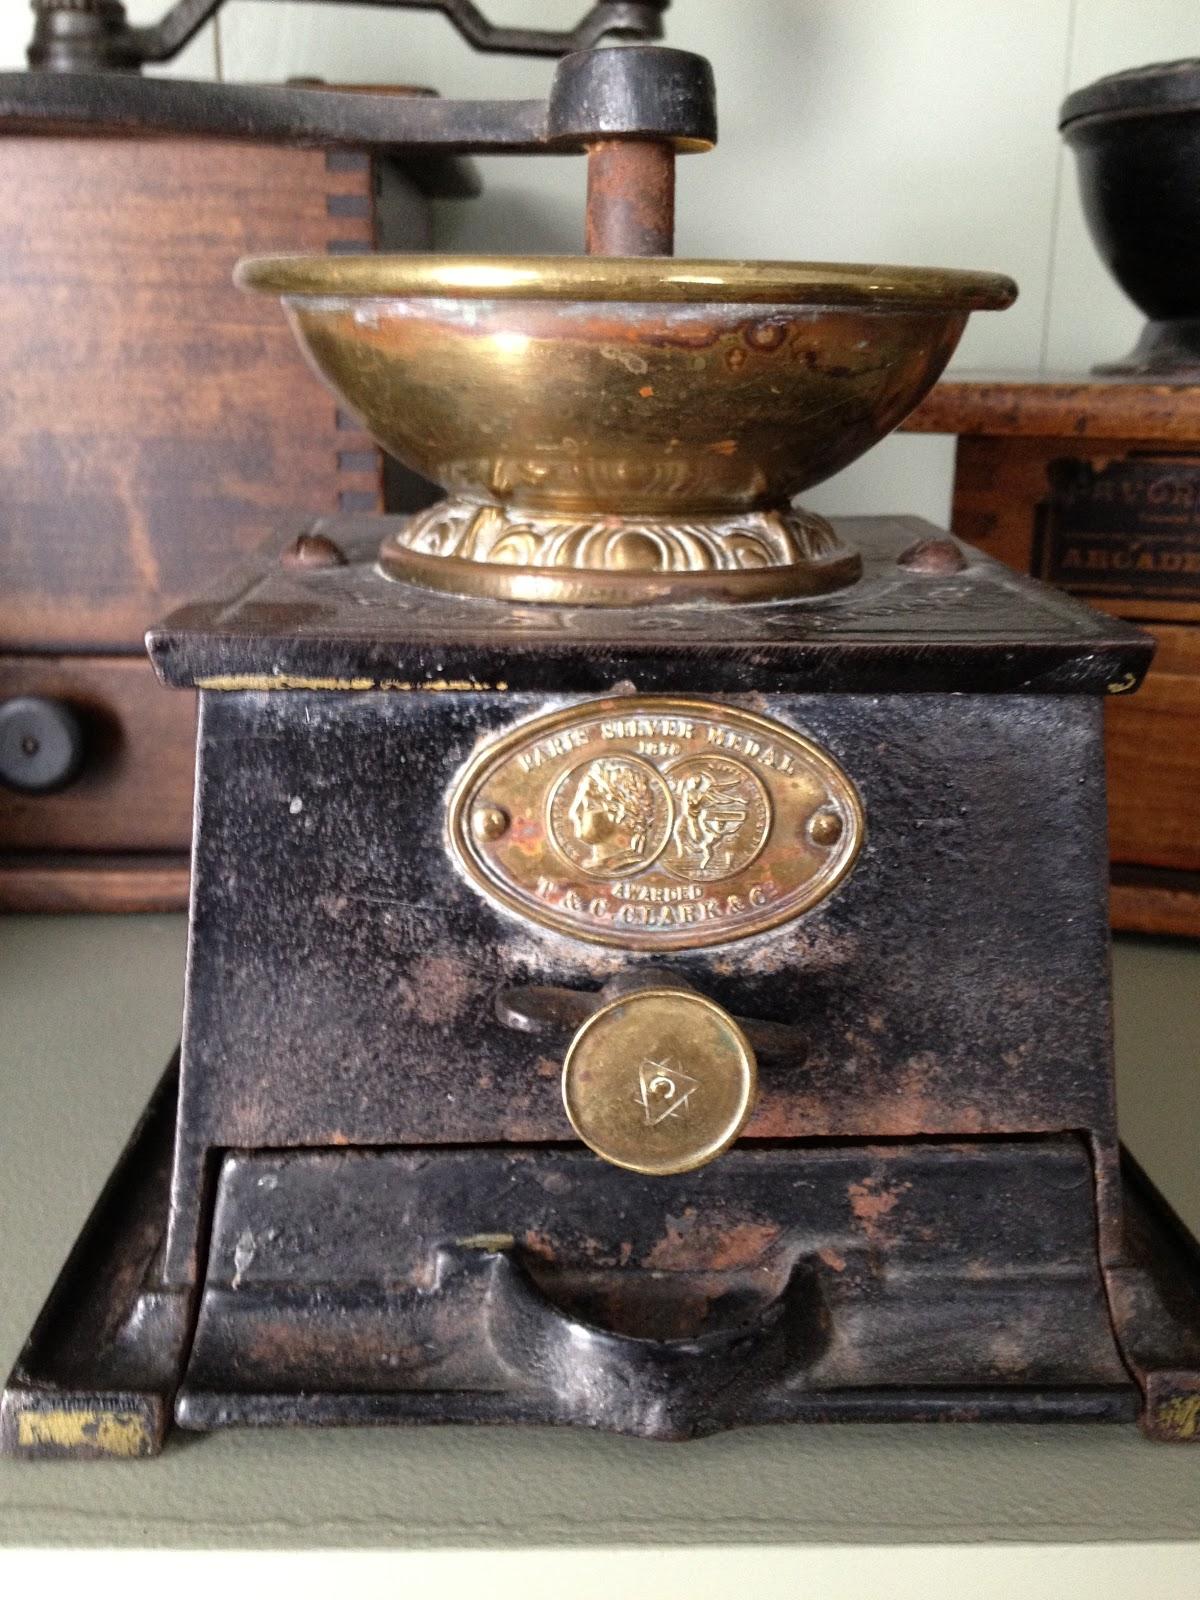 Antique Enterprise Cast Iron Double Wheel Coffee Grinder ...  |Coffee Grinders Antique Label